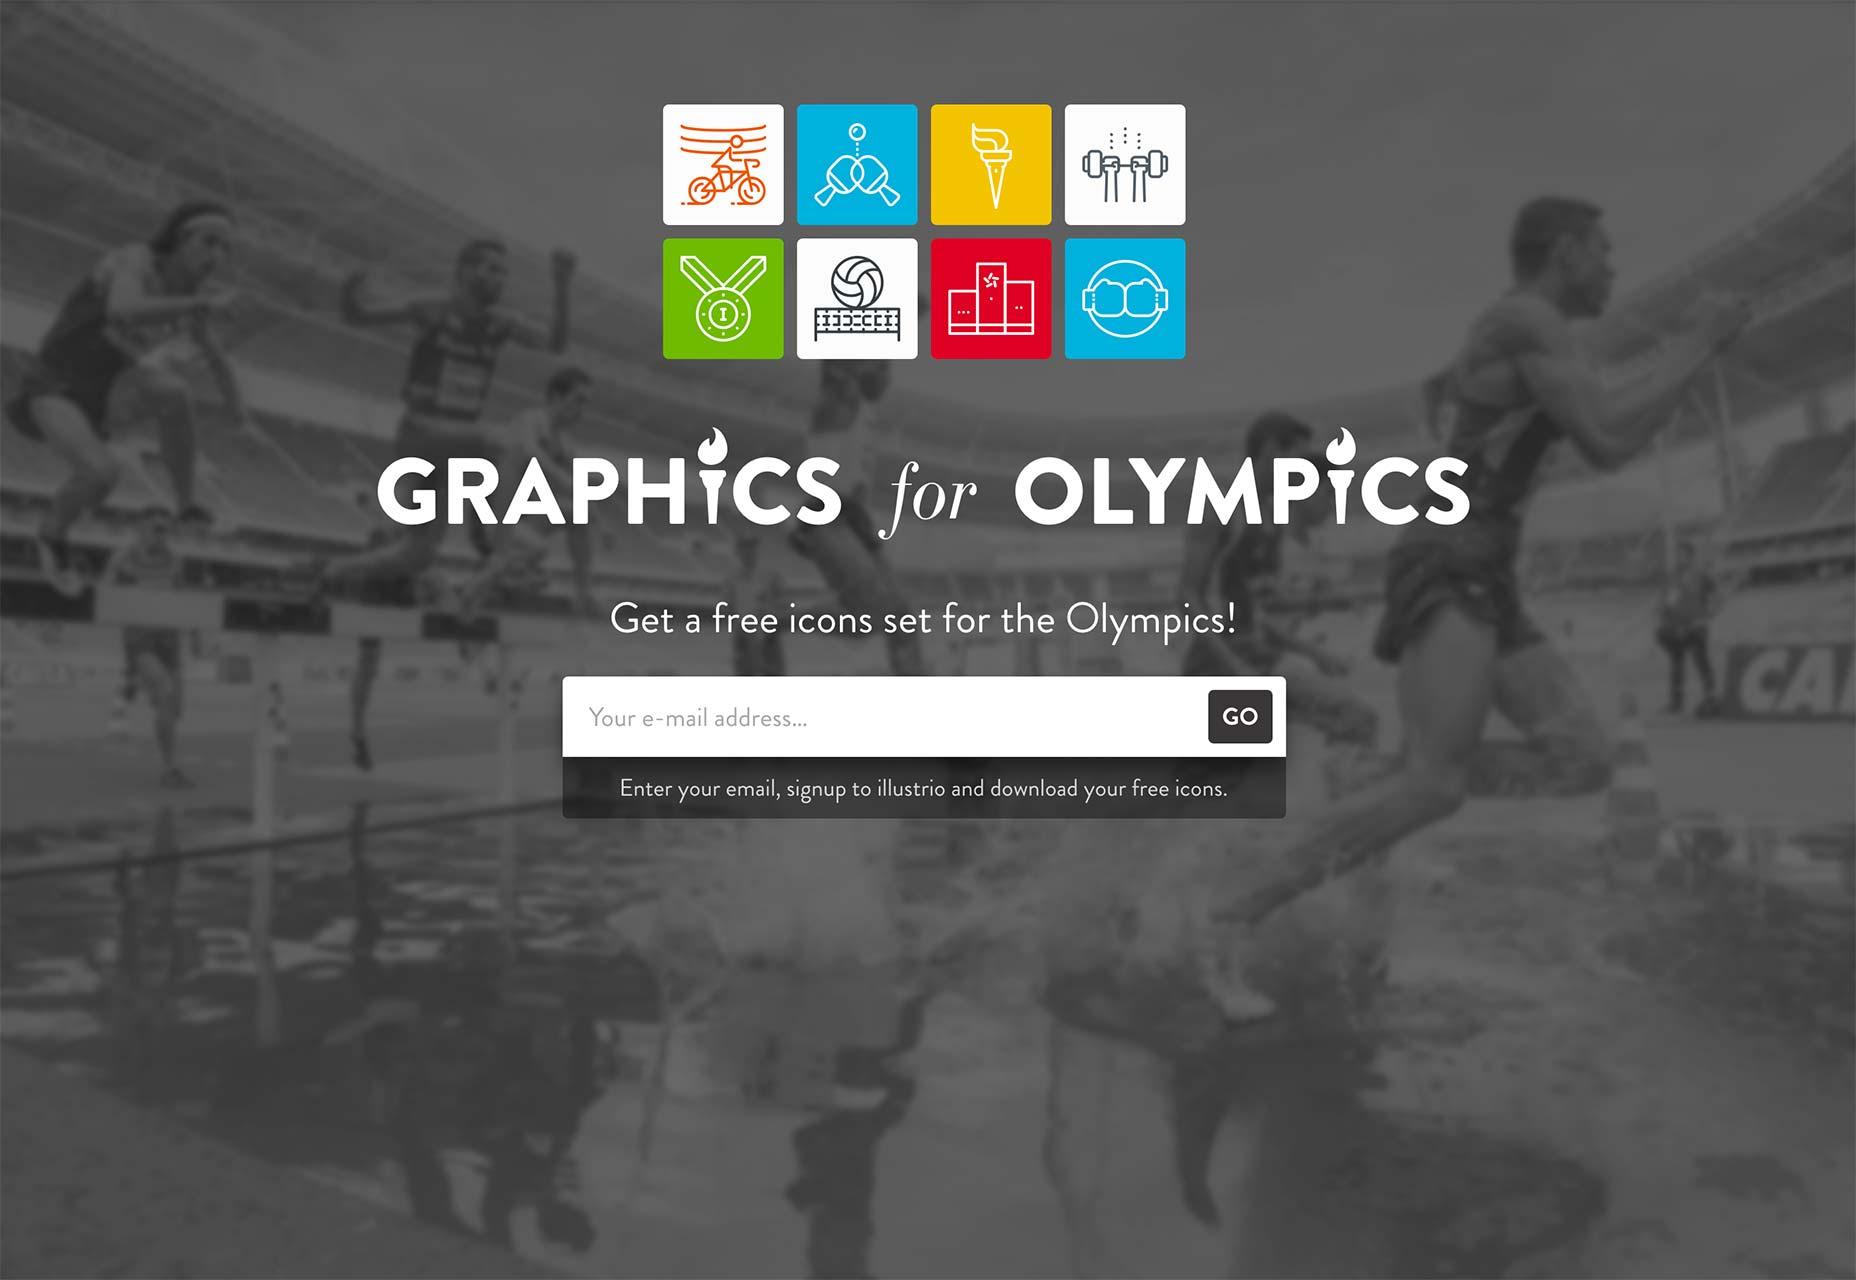 29olympics